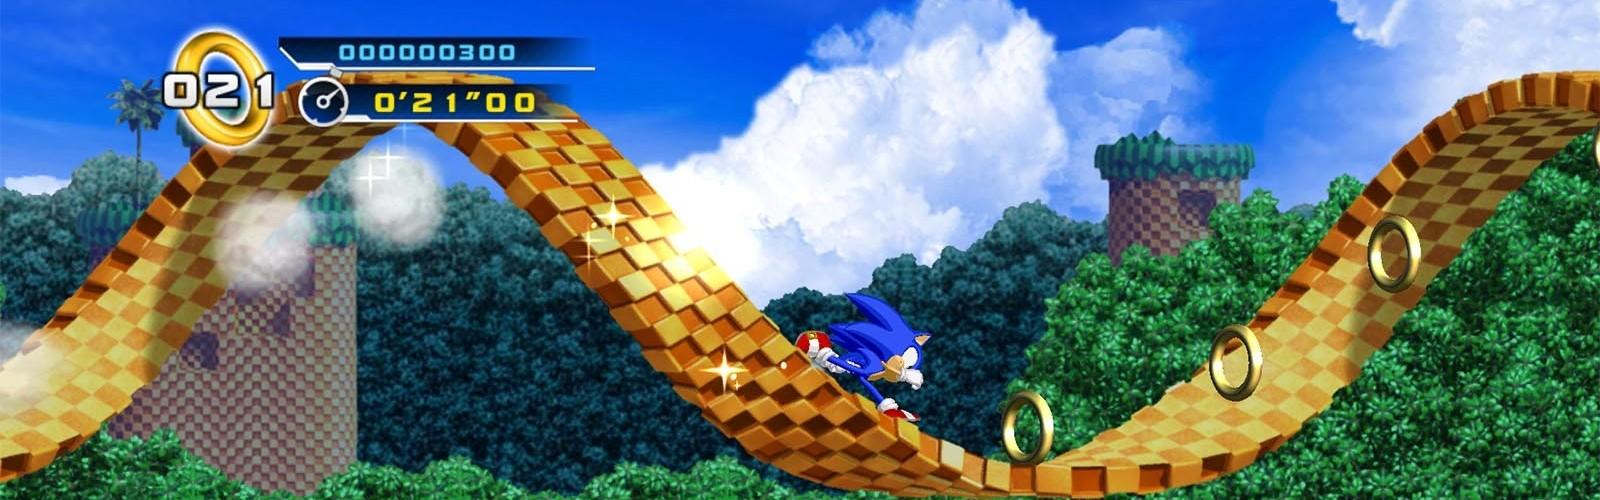 Sonic the Hedgehog 4 - Complete Steam Key GLOBAL